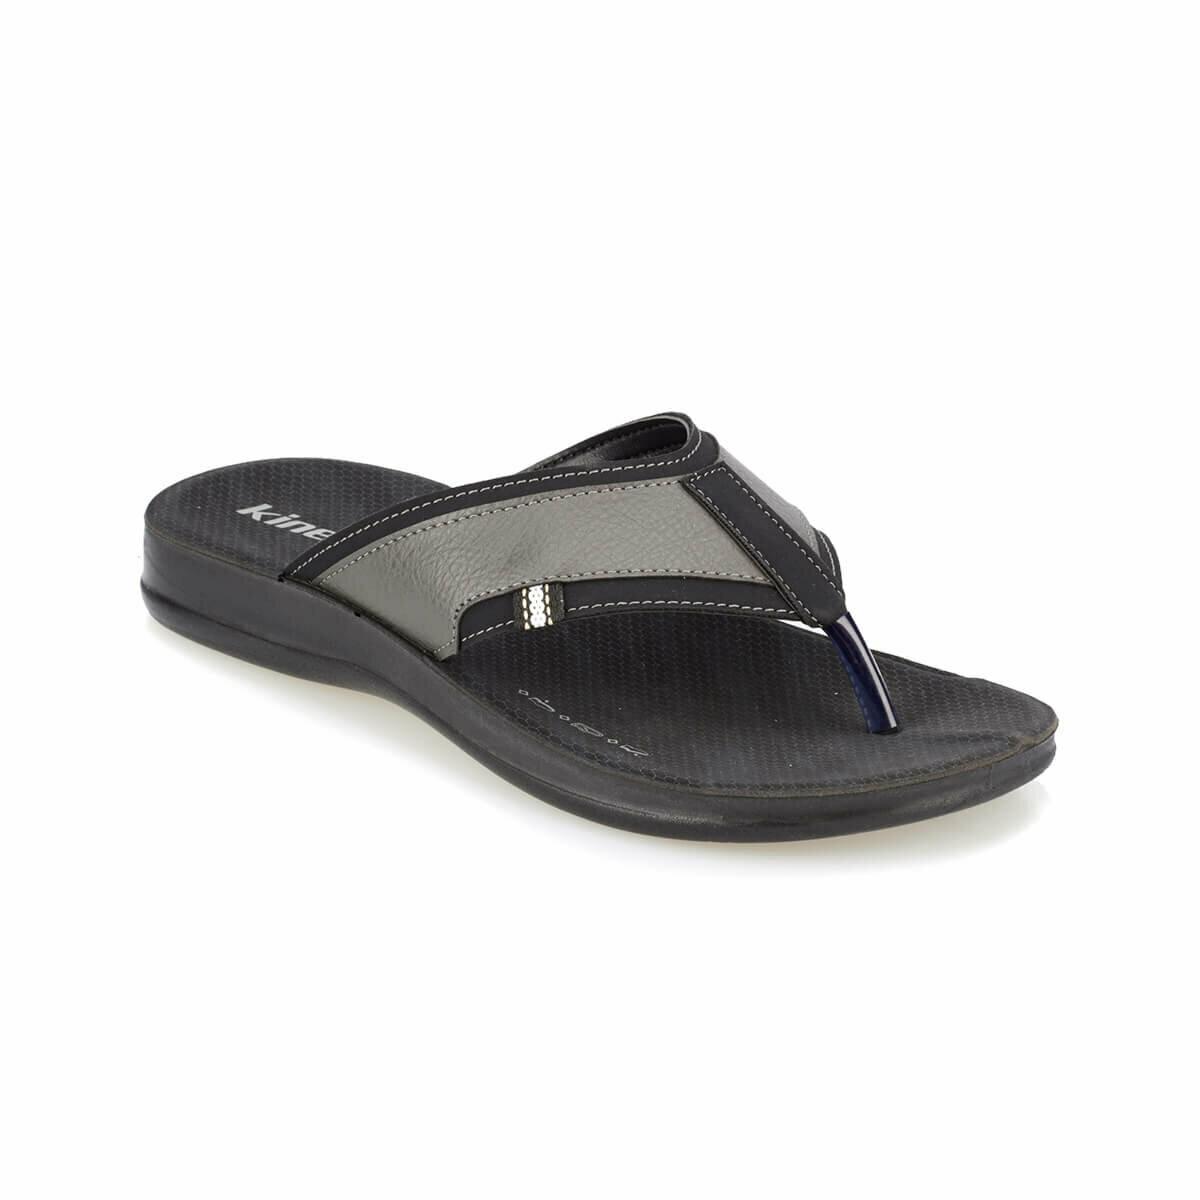 FLO ANIBAL Black Male Slippers KINETIX